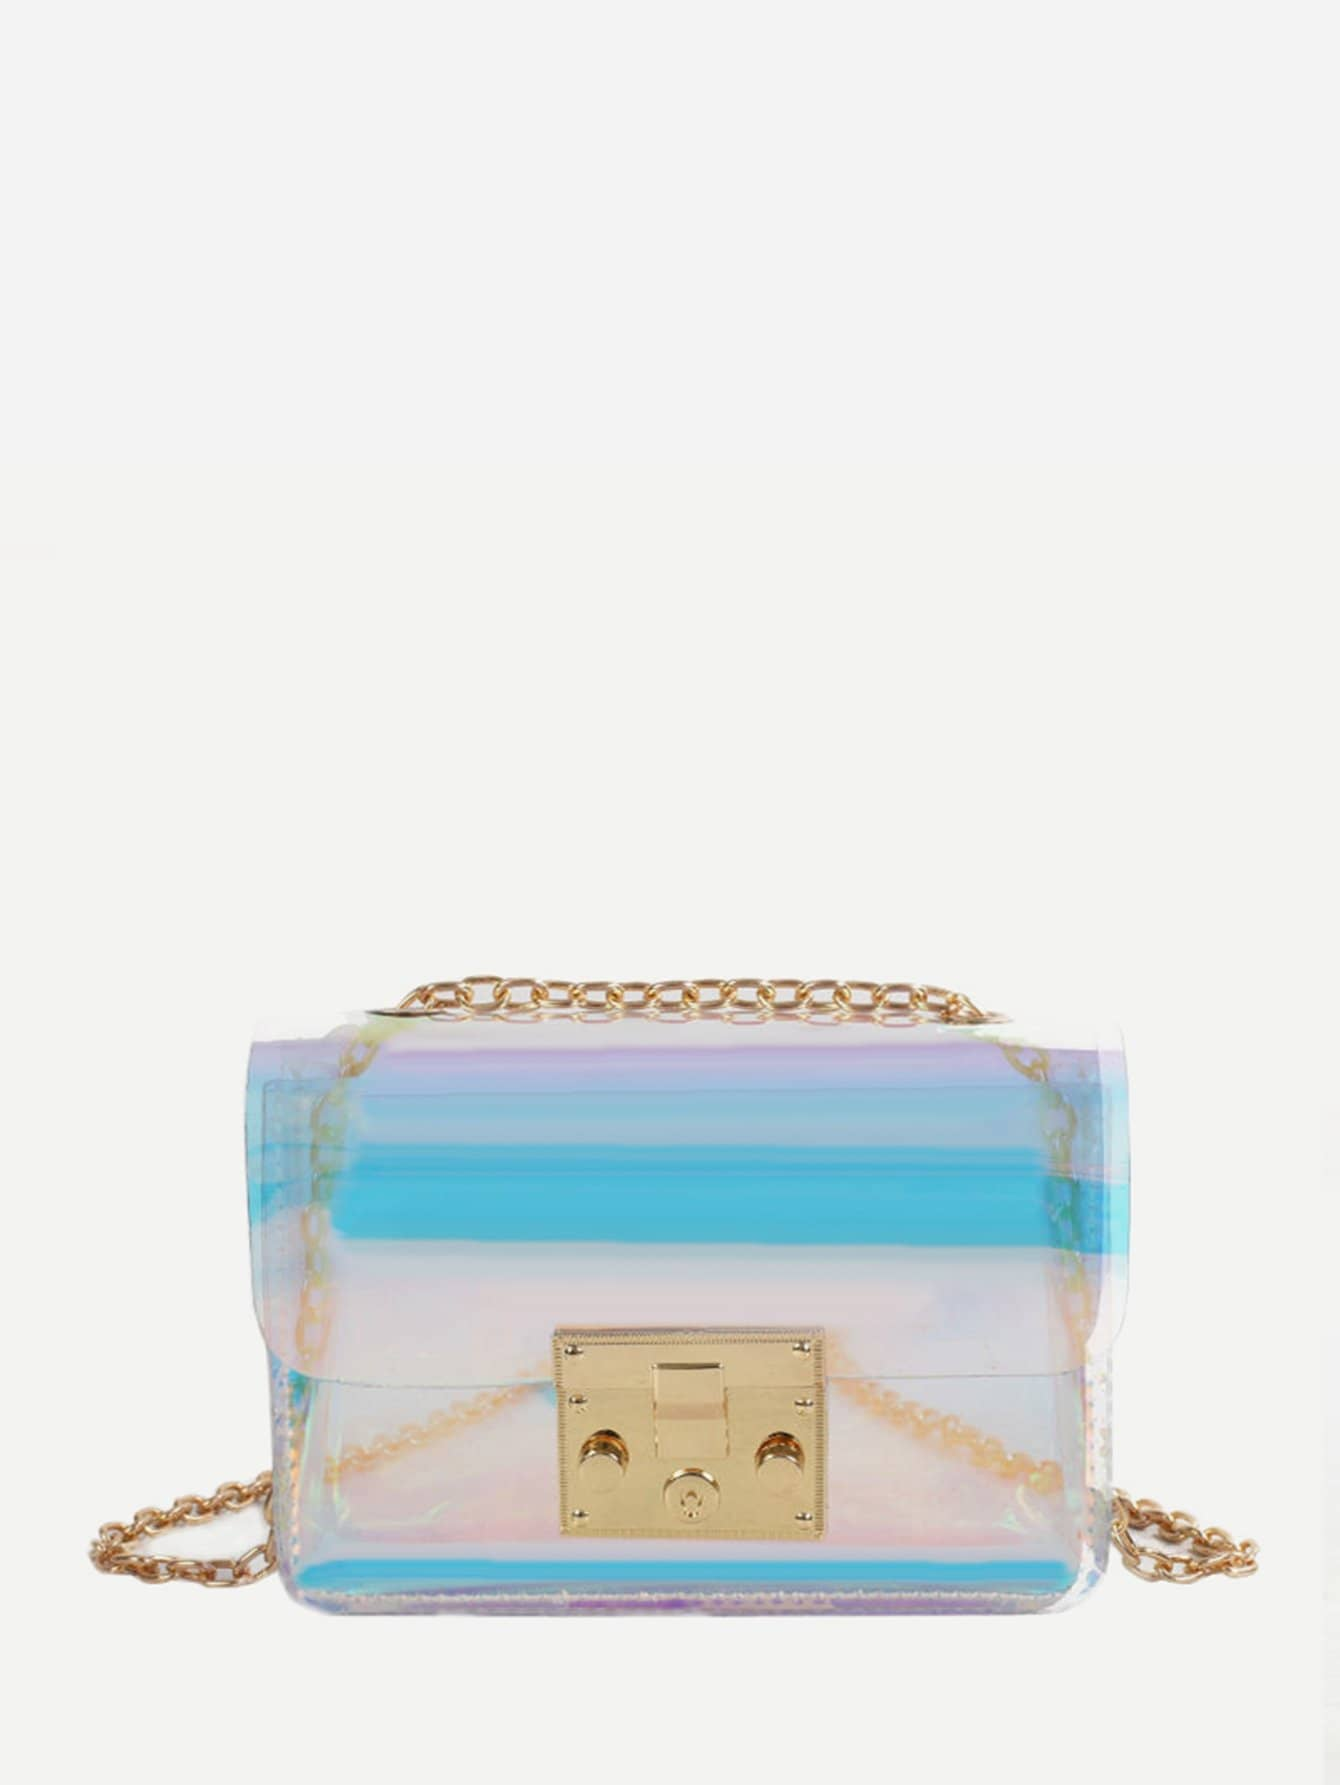 Clear PVC Chain Bag buckle front clear chain bag